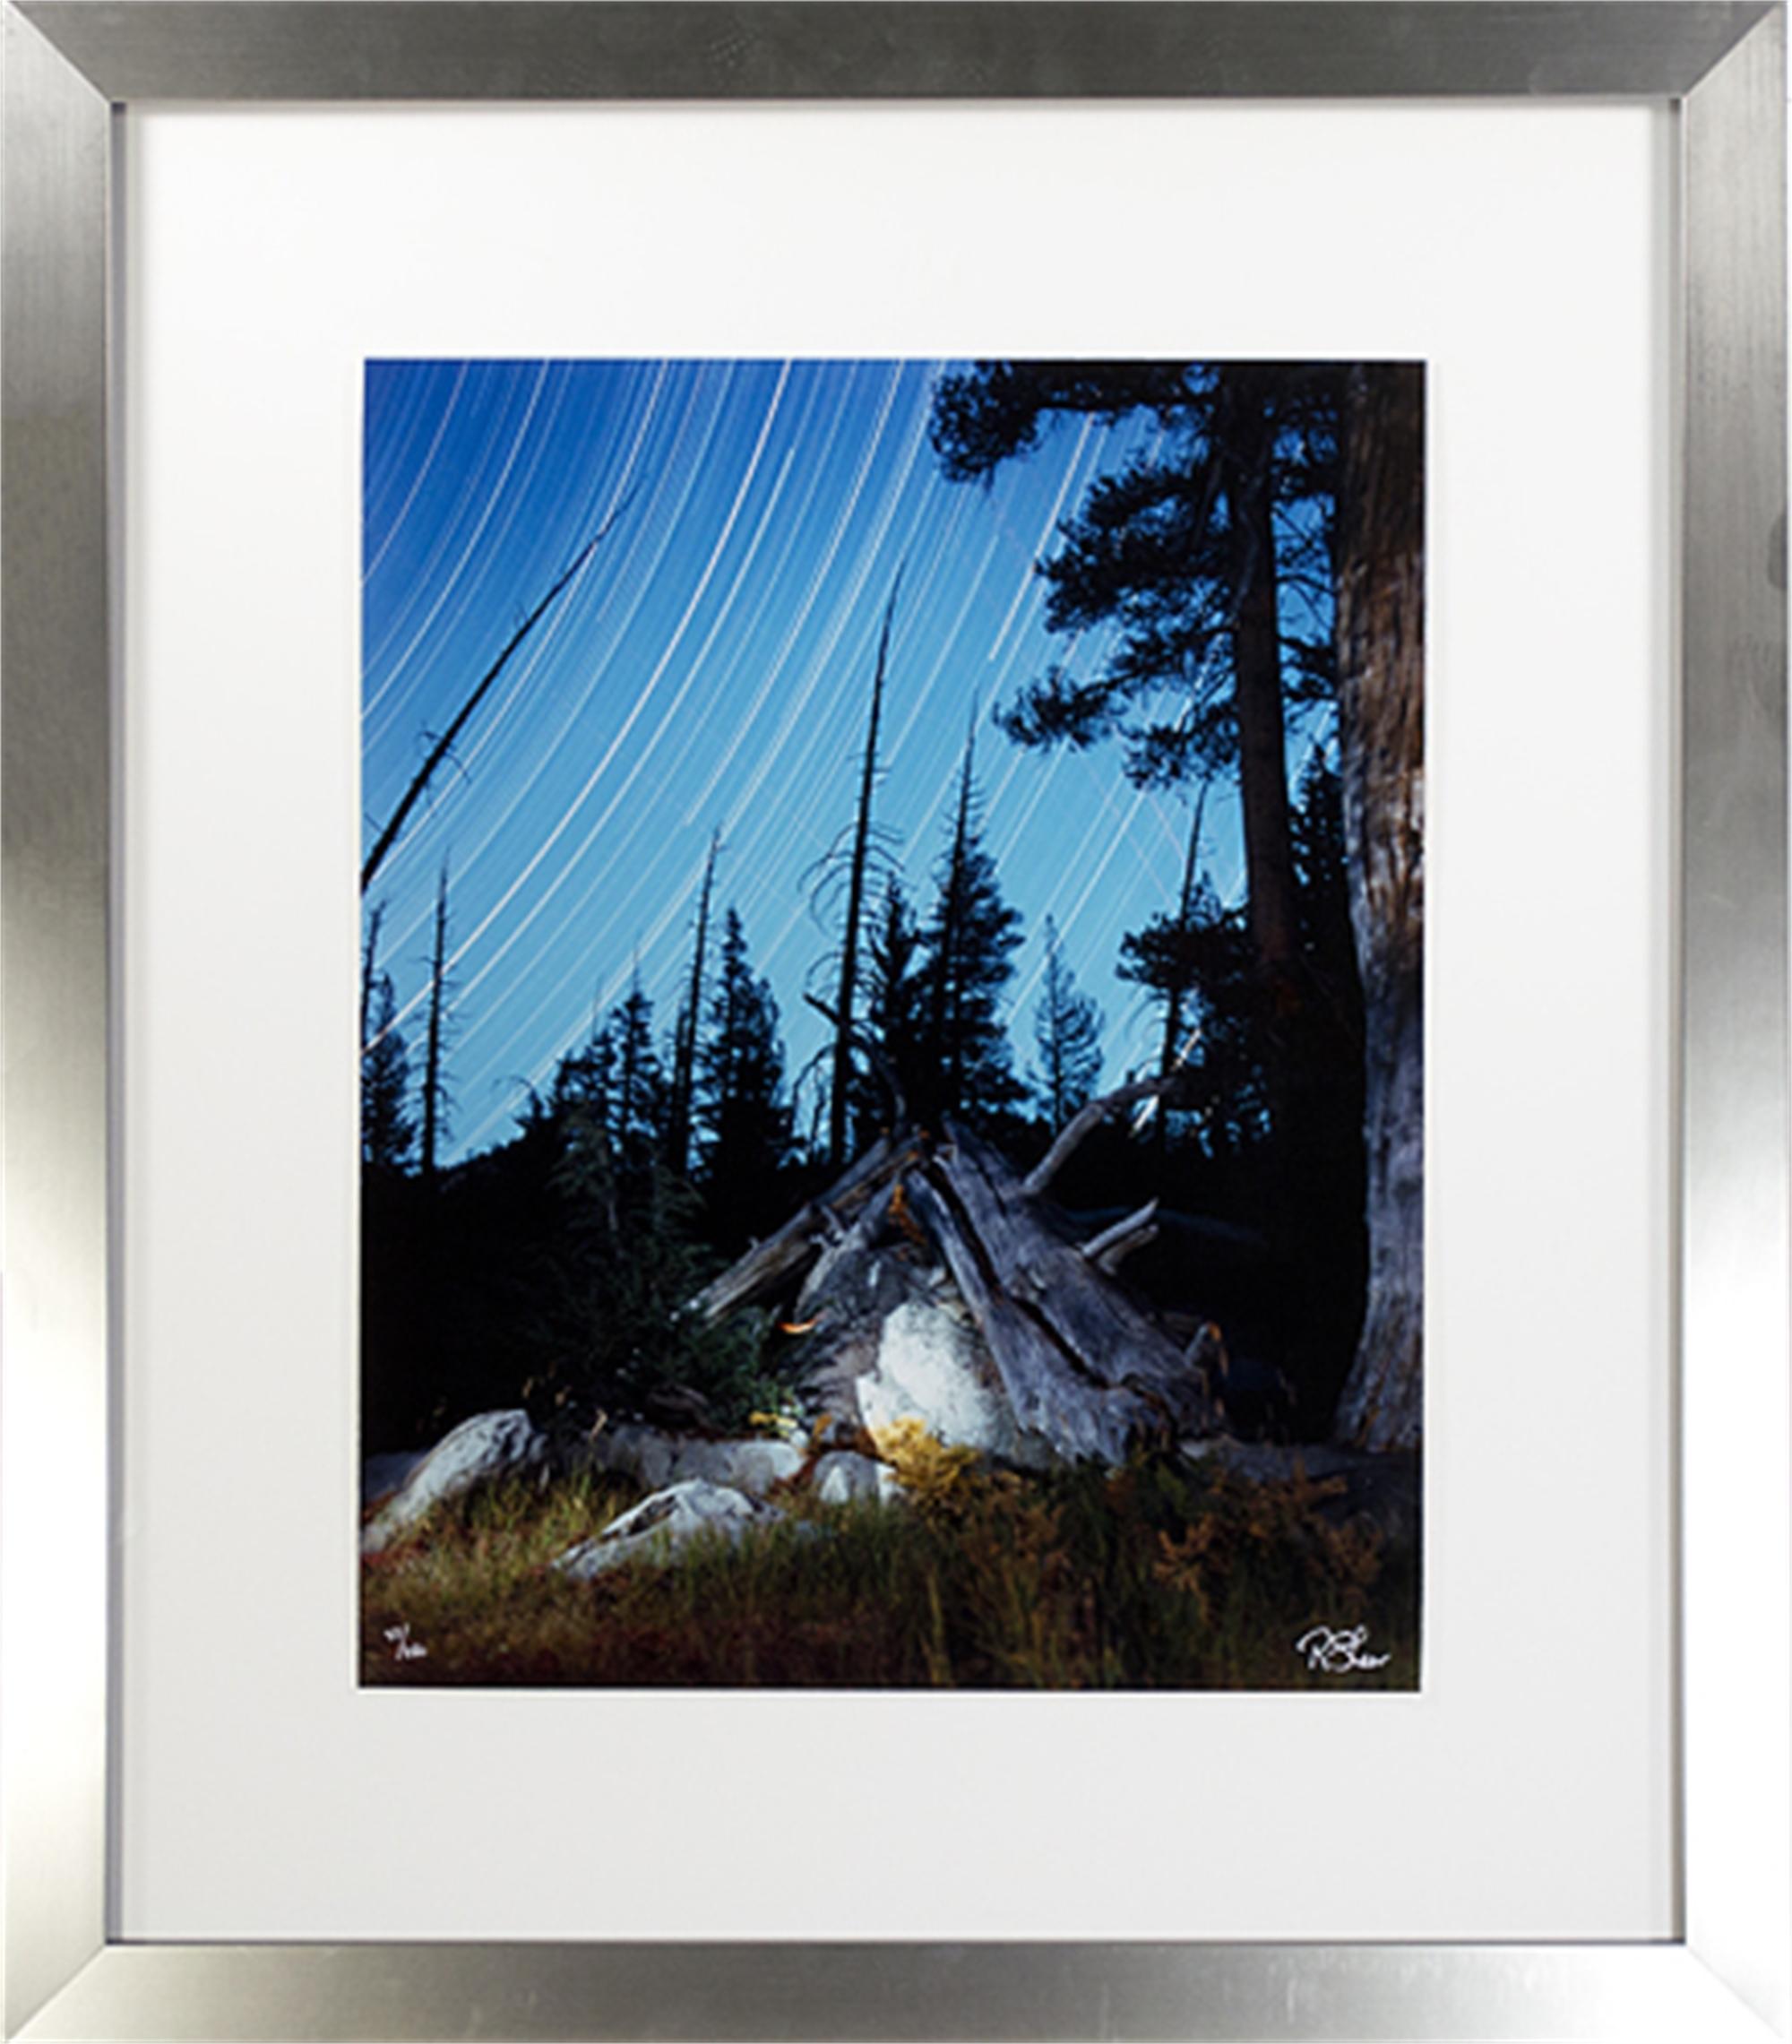 The Spirit of John Muir with Star Trails,Yosemite by Robert Kawika Sheer